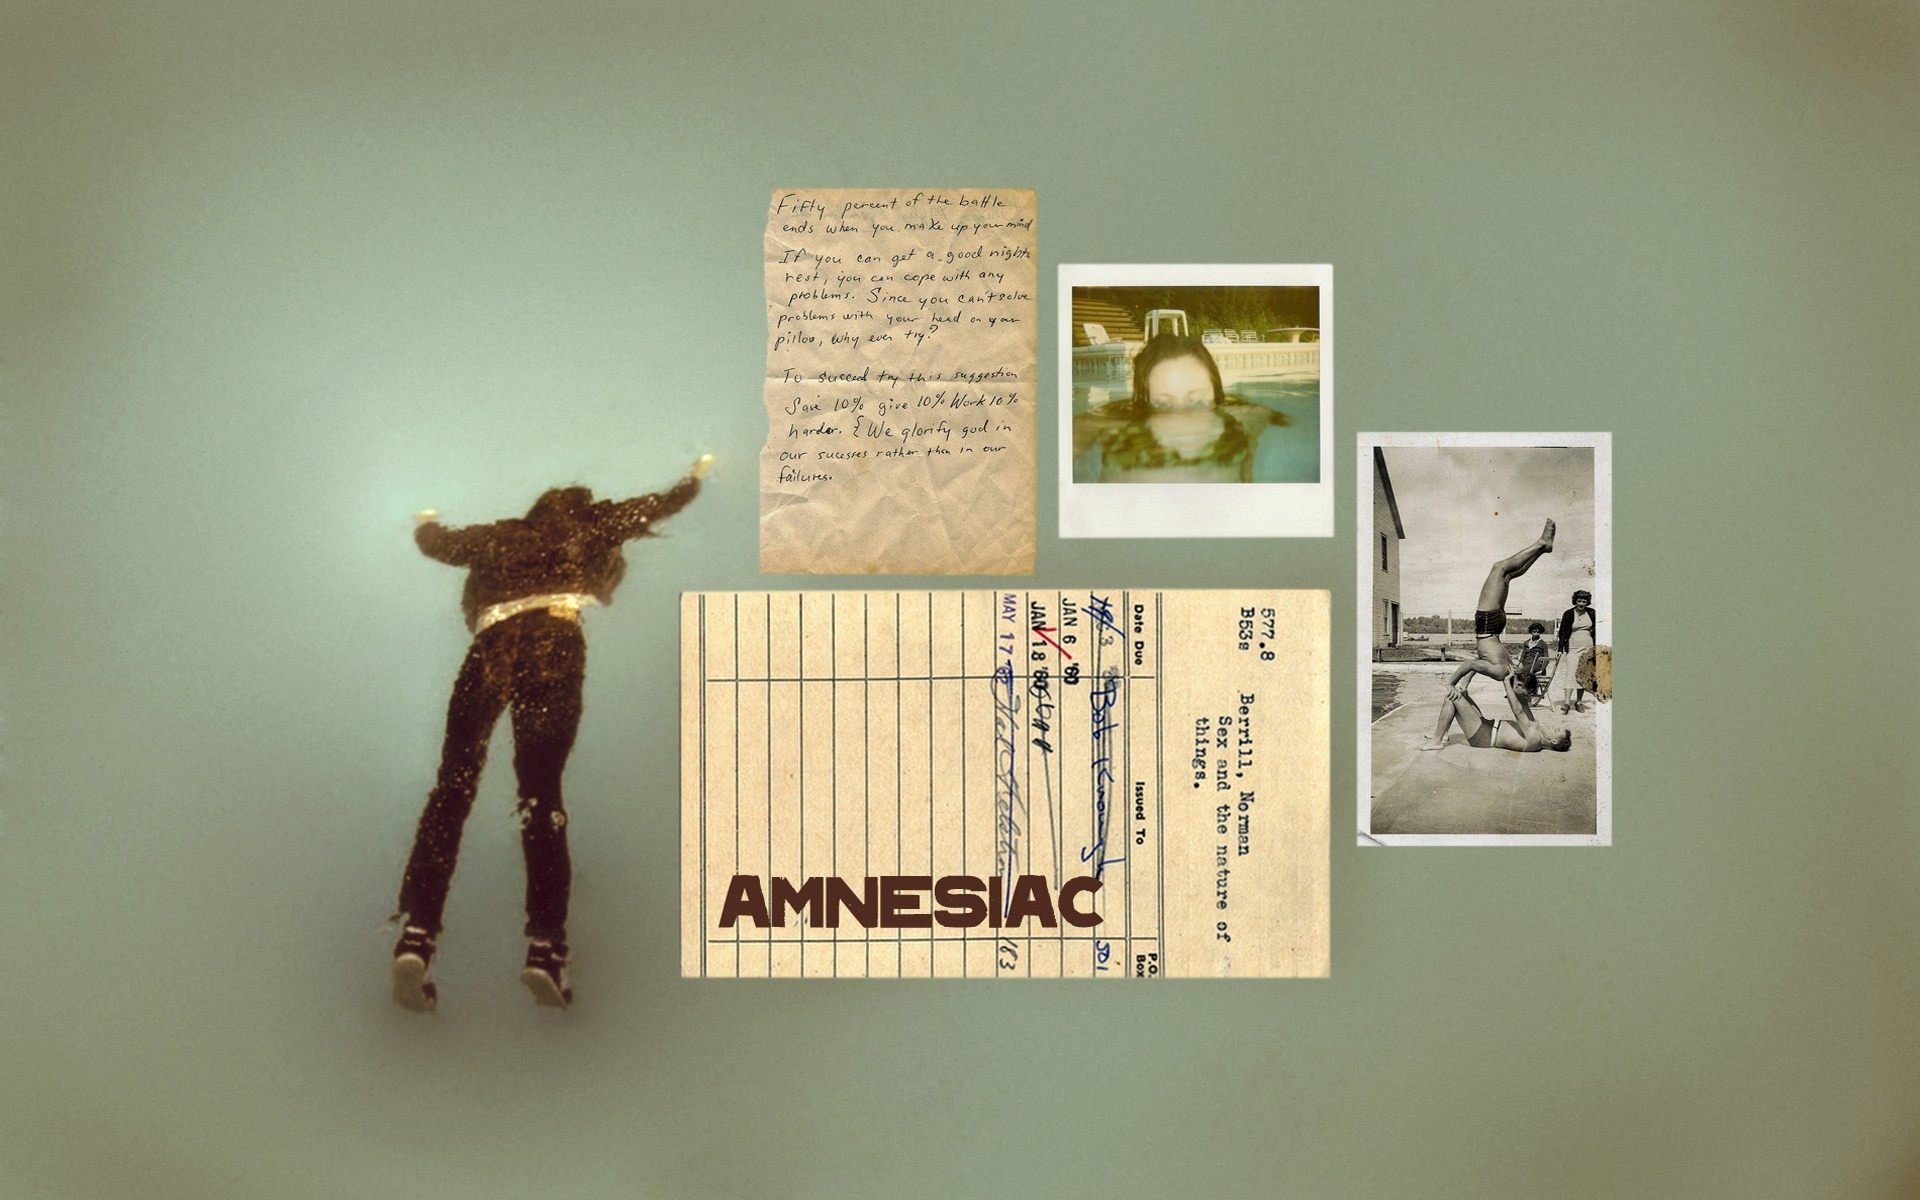 Radiohead Countdown Wallpaper: #5 of 7 Amnesiac